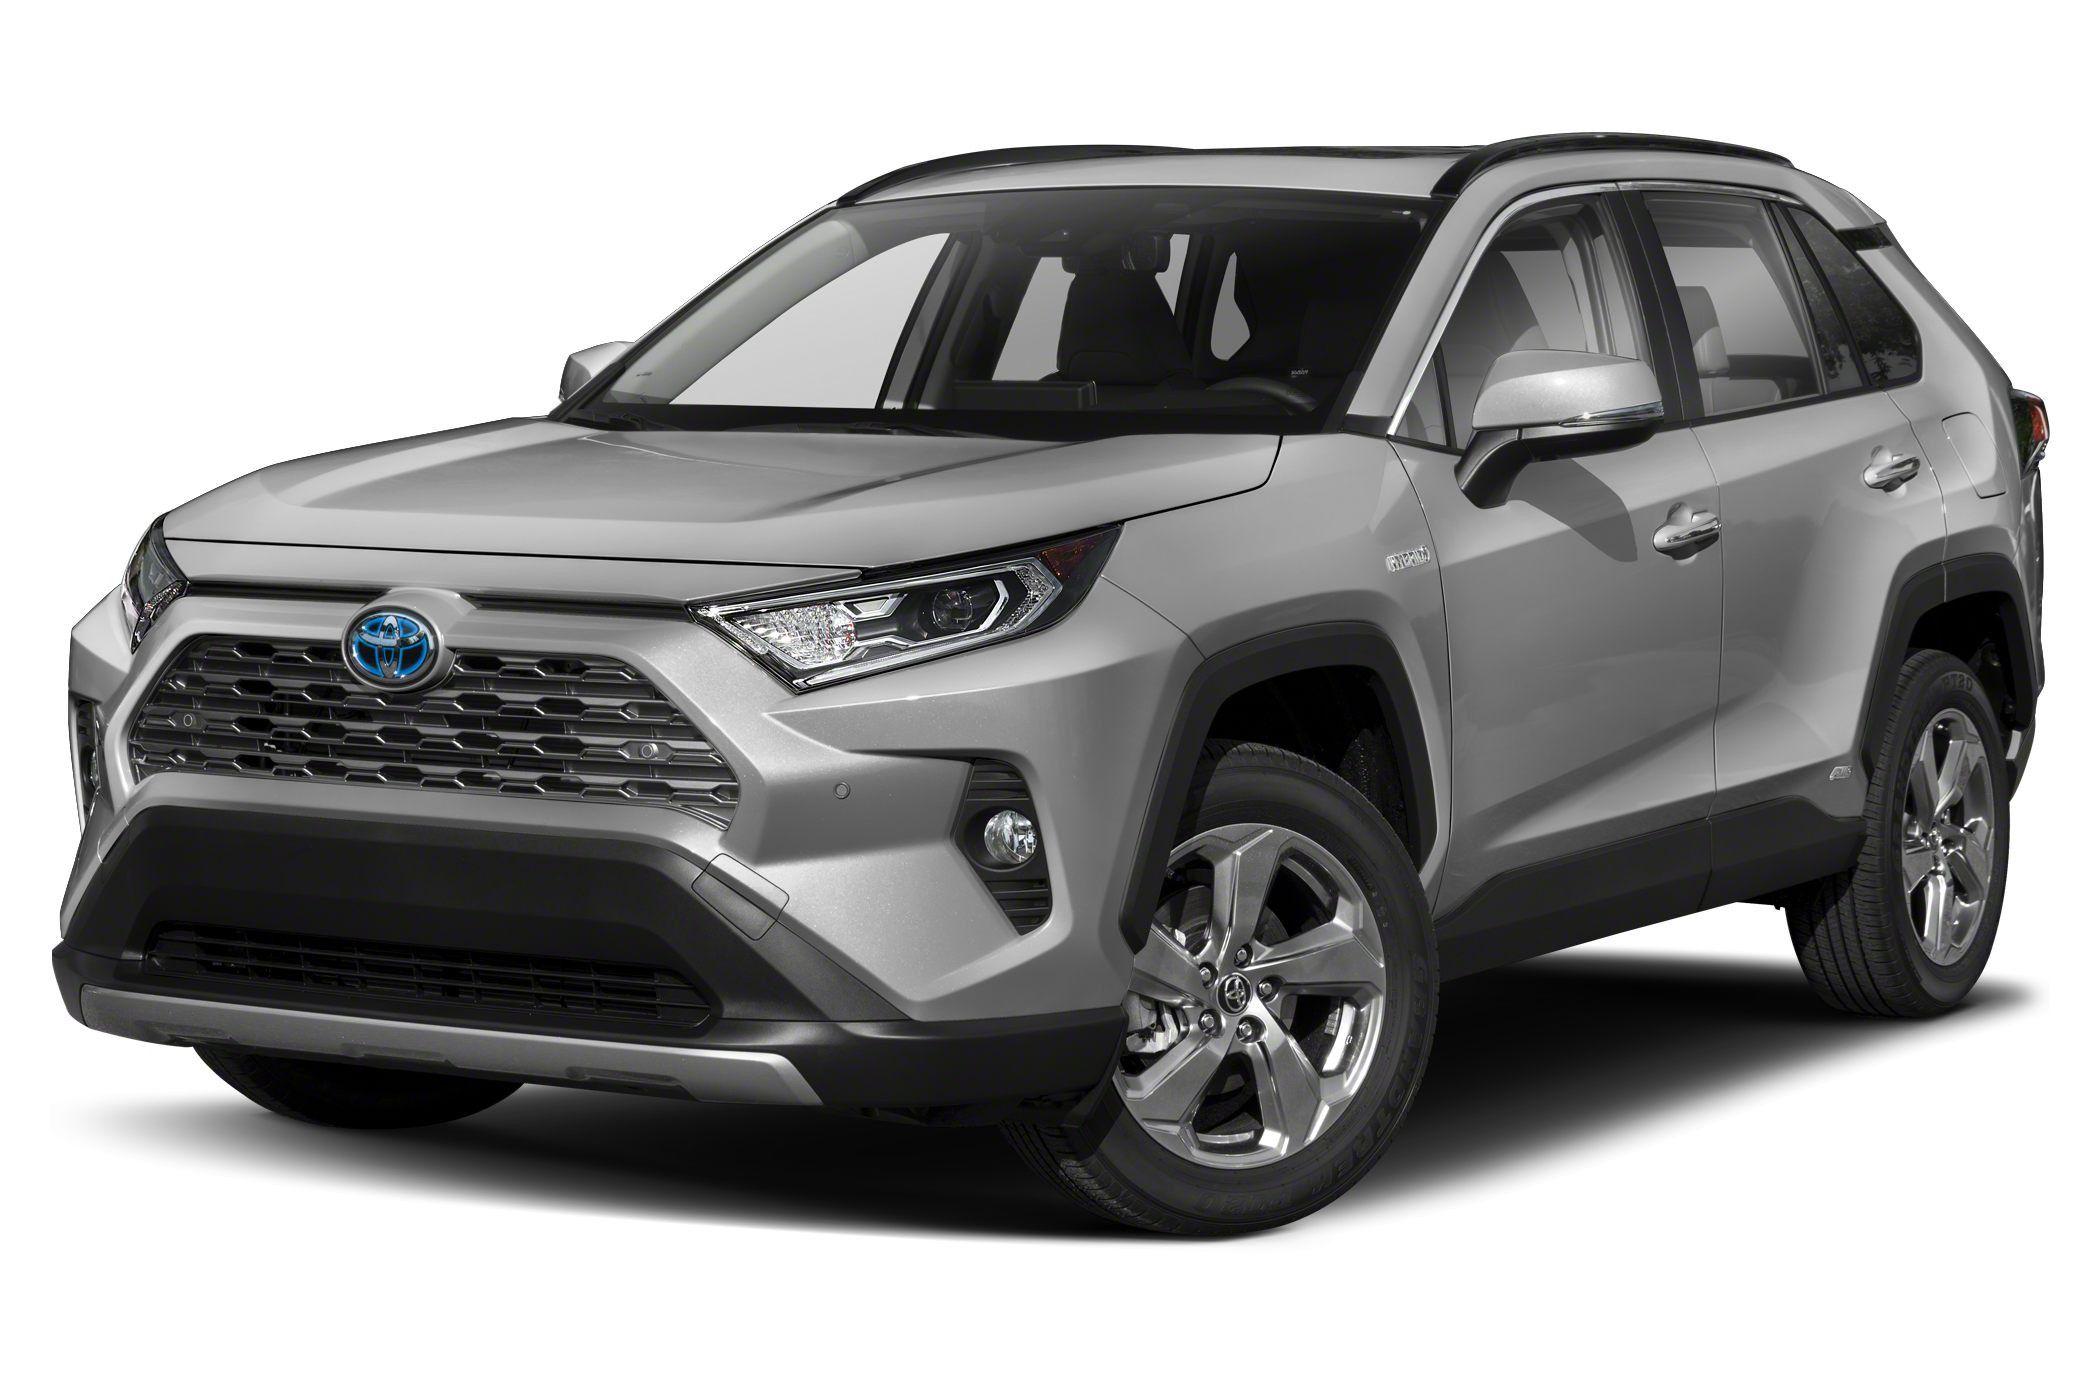 2019 toyota Rav4 Hybrid Toyota rav4 hybrid, Rav4 hybrid